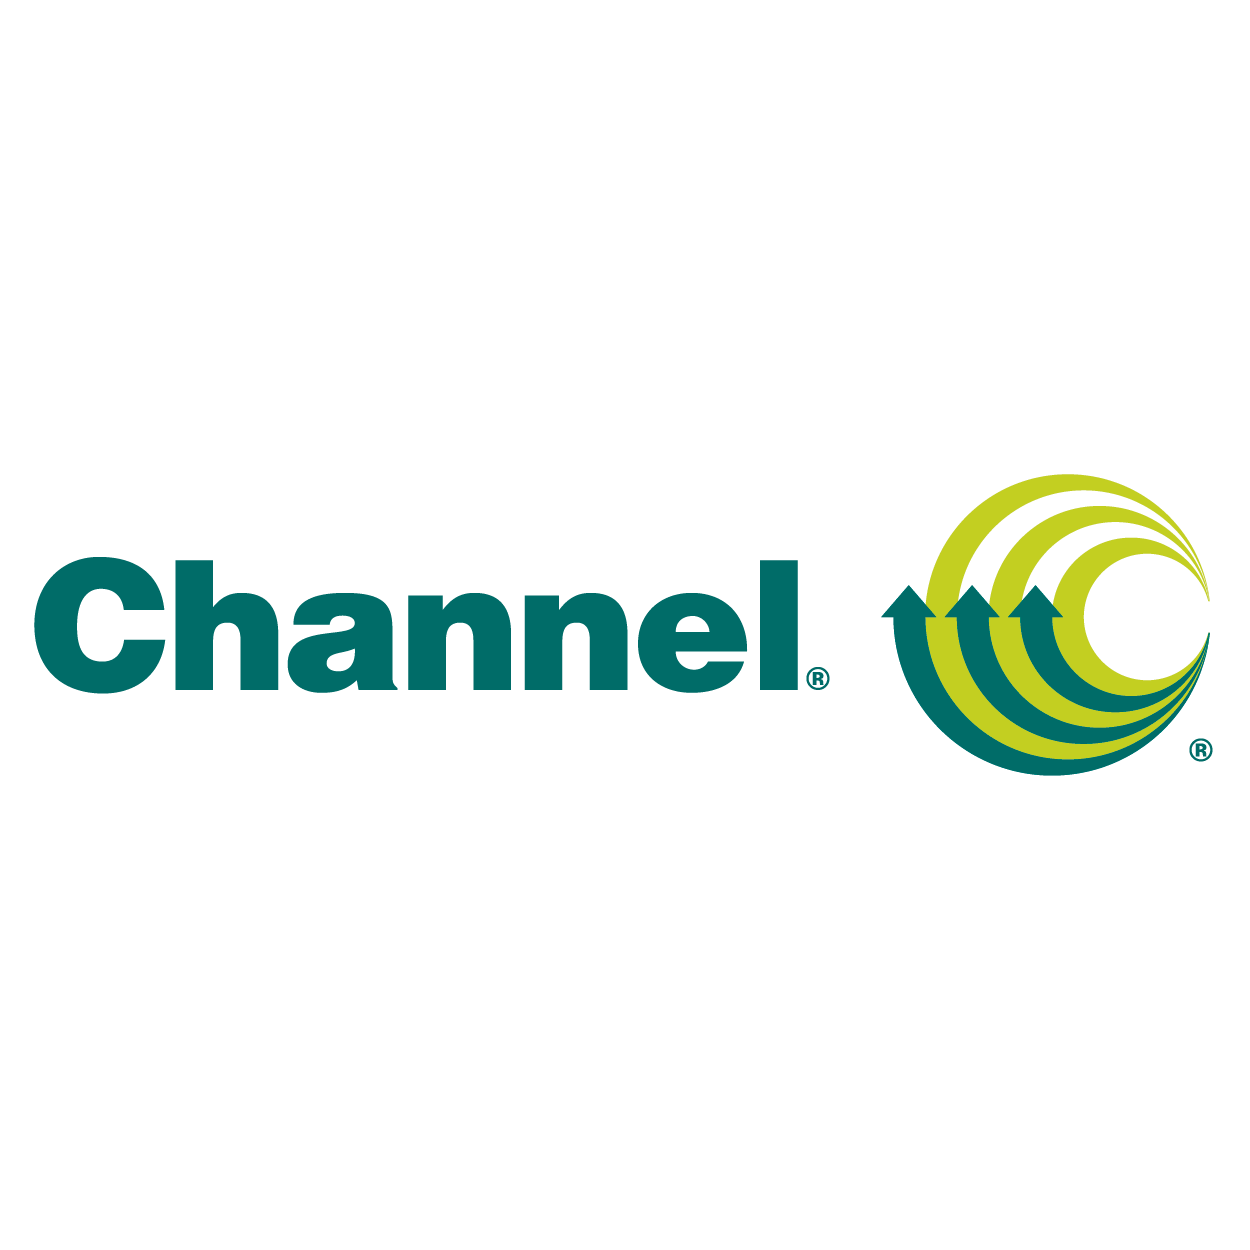 Channel Stickers messages sticker-5